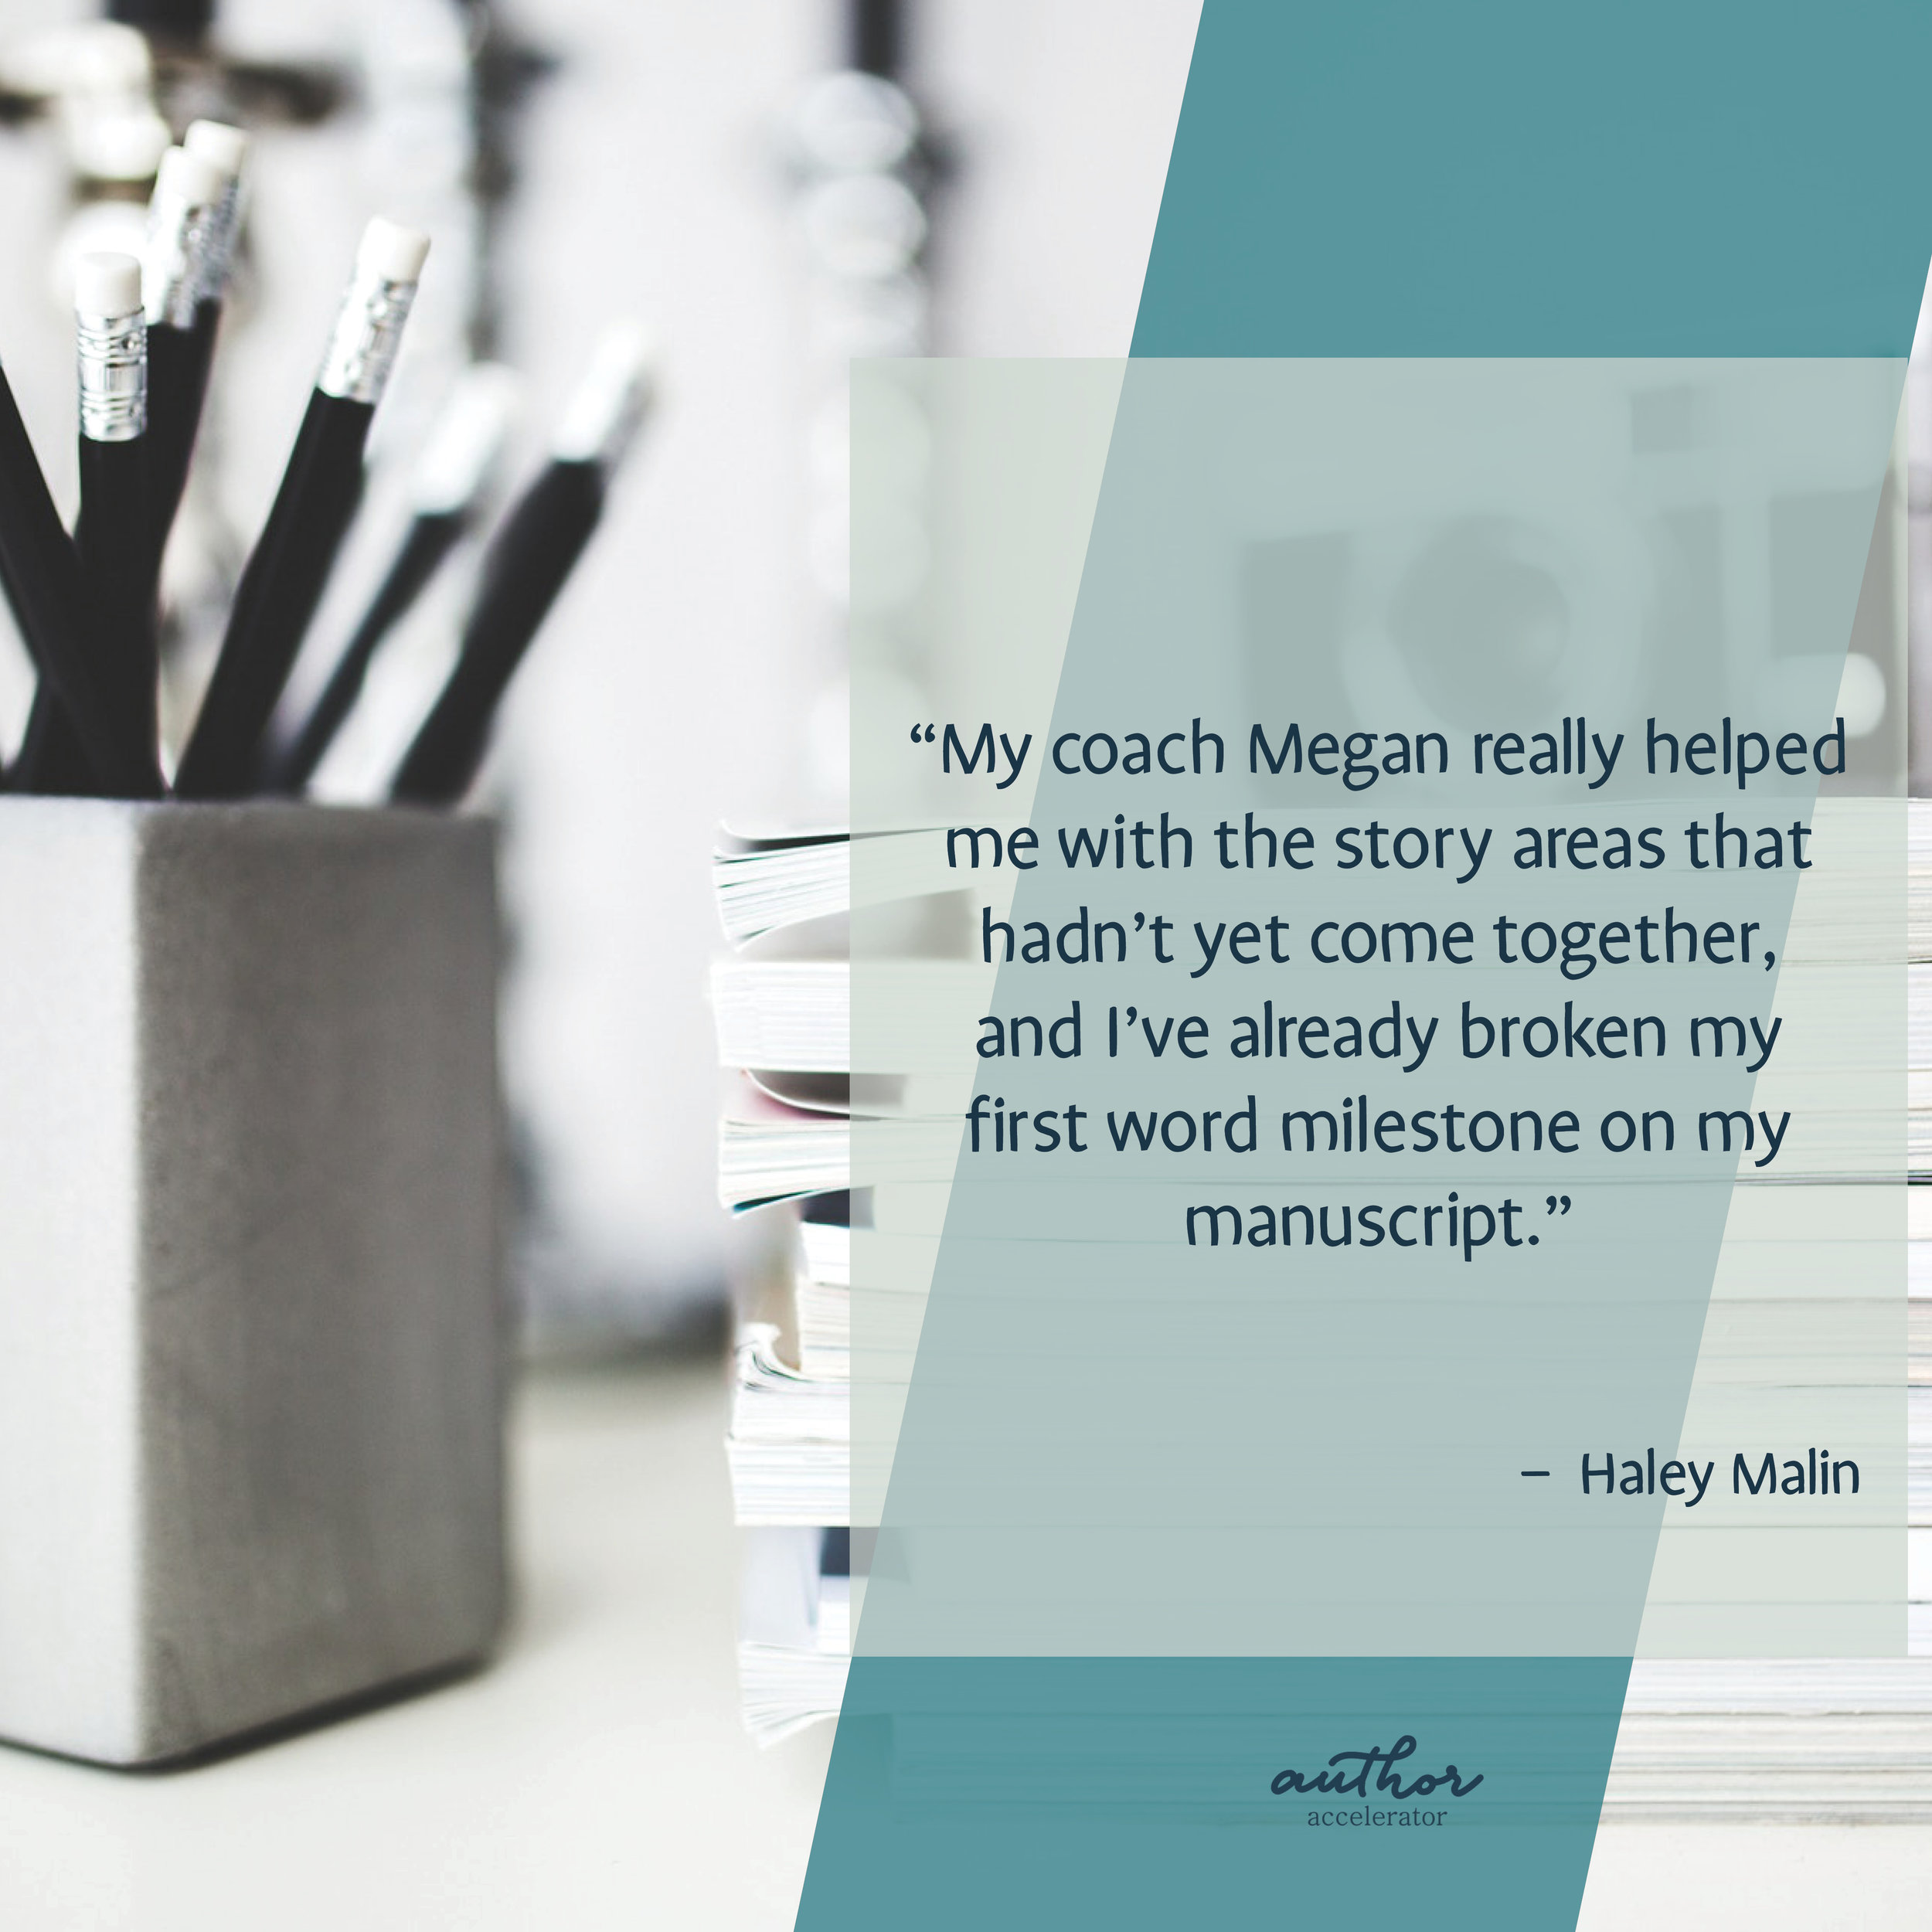 coach_megan_lally_haley_malin.jpg